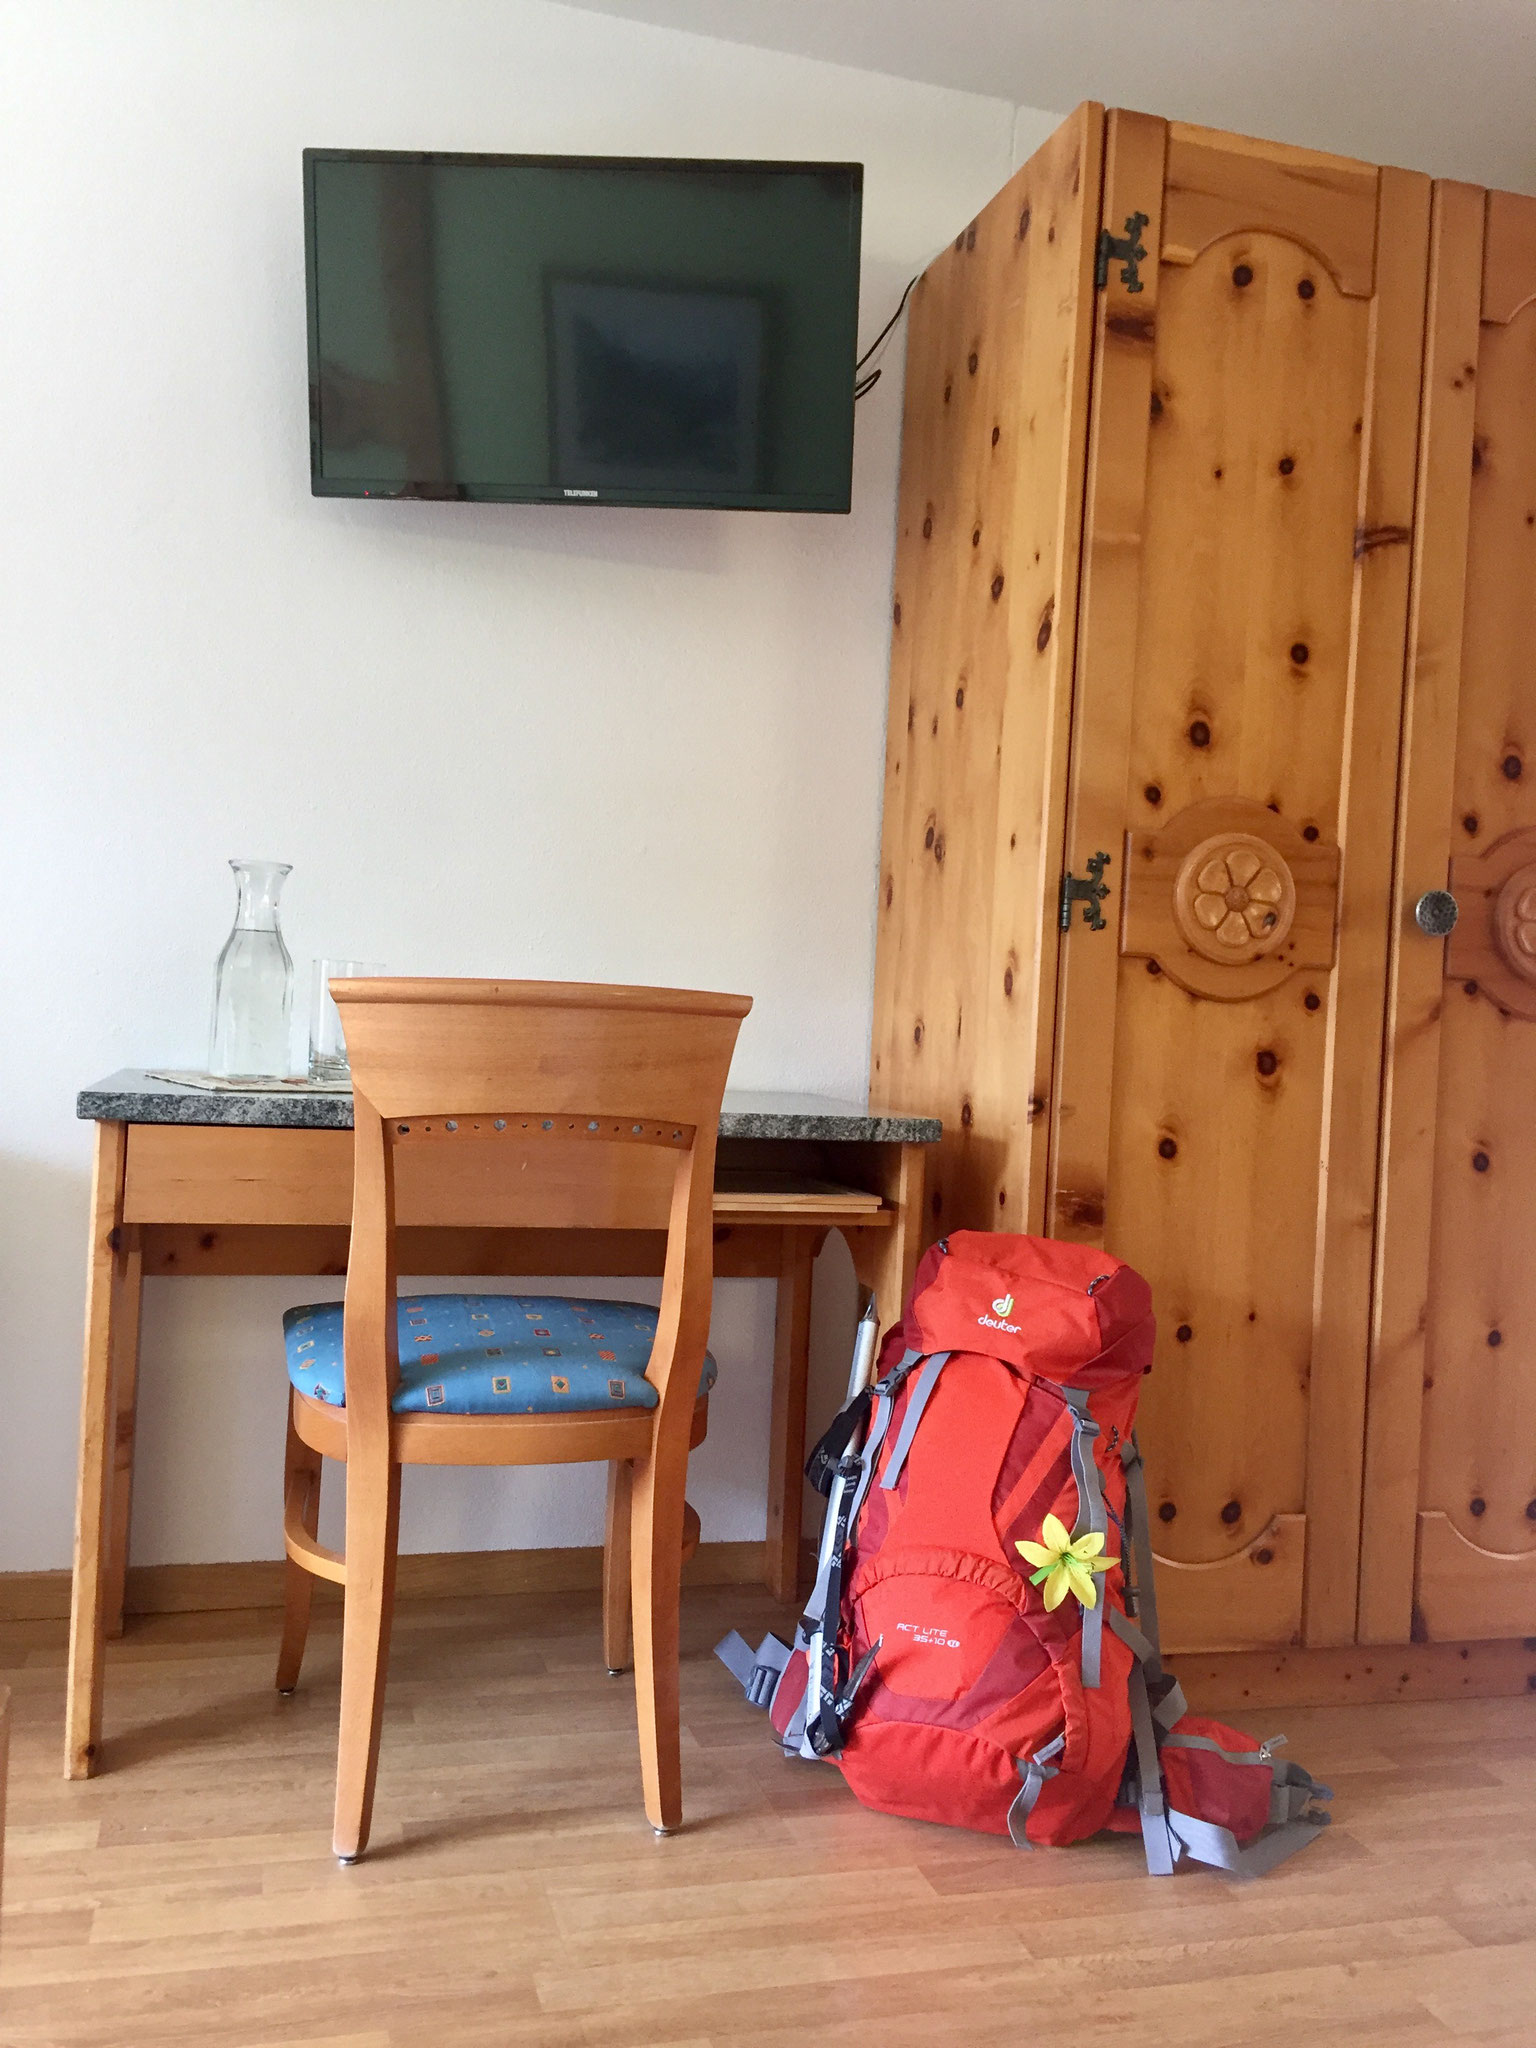 Flatscreen-TVs in all rooms.